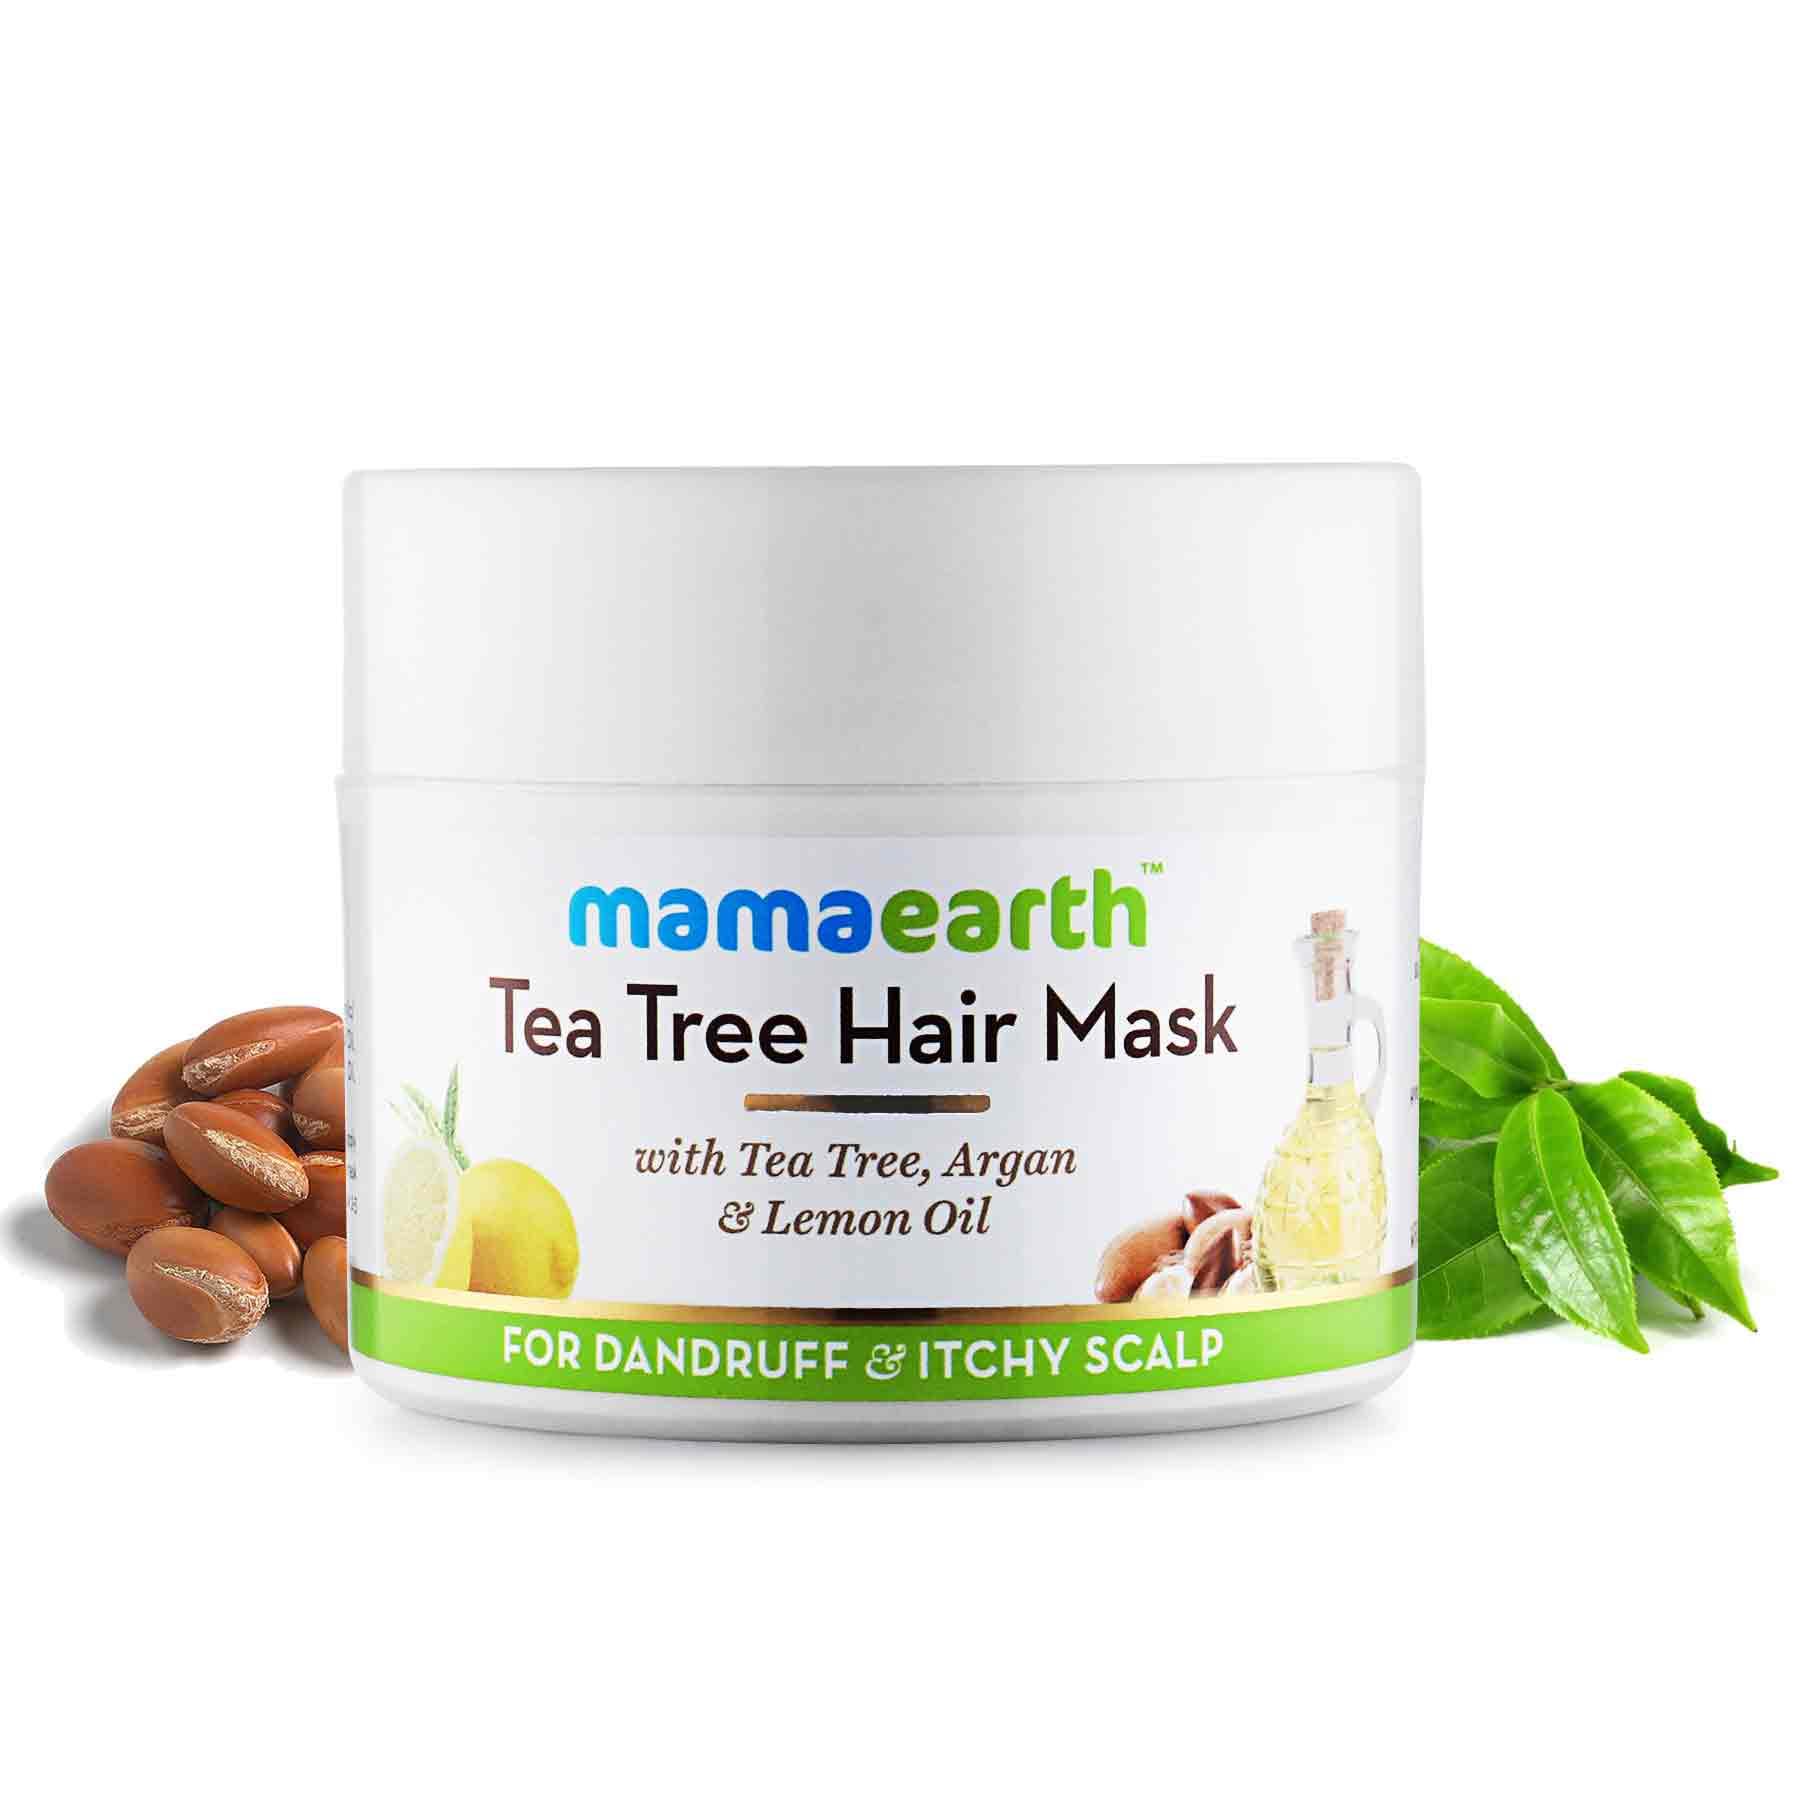 Mamaearth Tea Tree Hair Mask Hair Mask For Dandruff 200 Ml